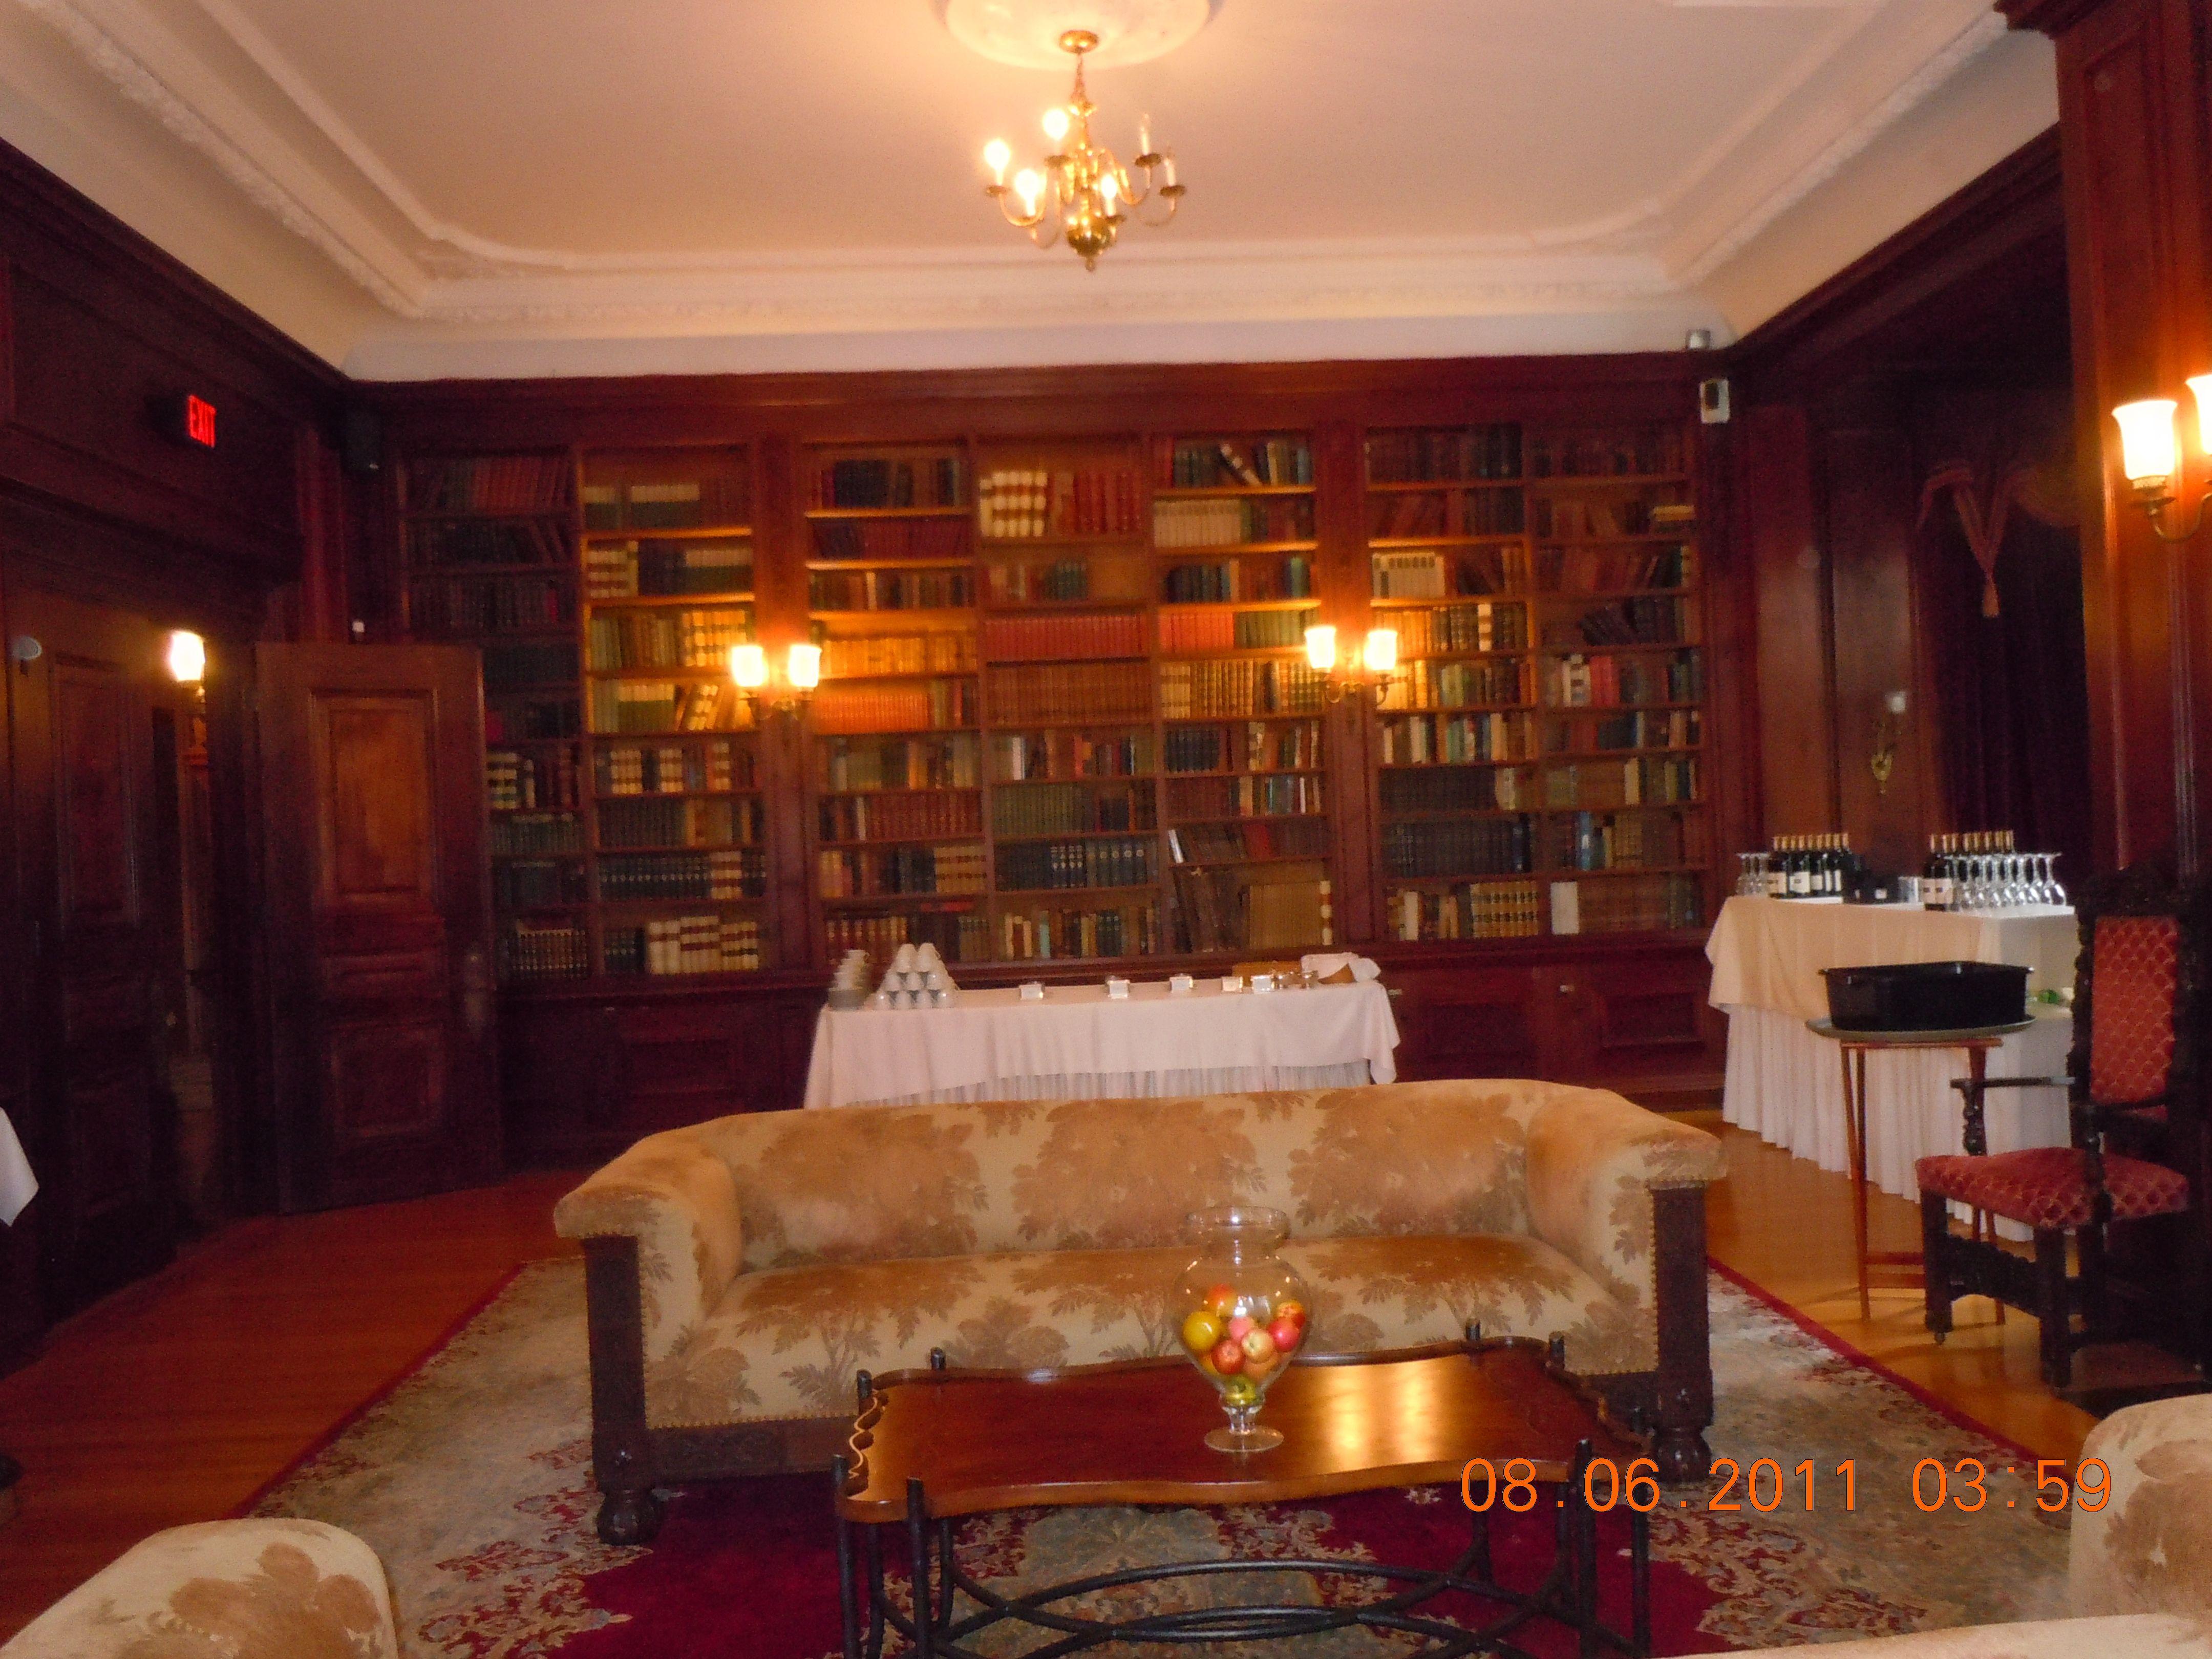 Mansion On Turner Hill Ipswich MA MassachusettsWedding VenuesMansions